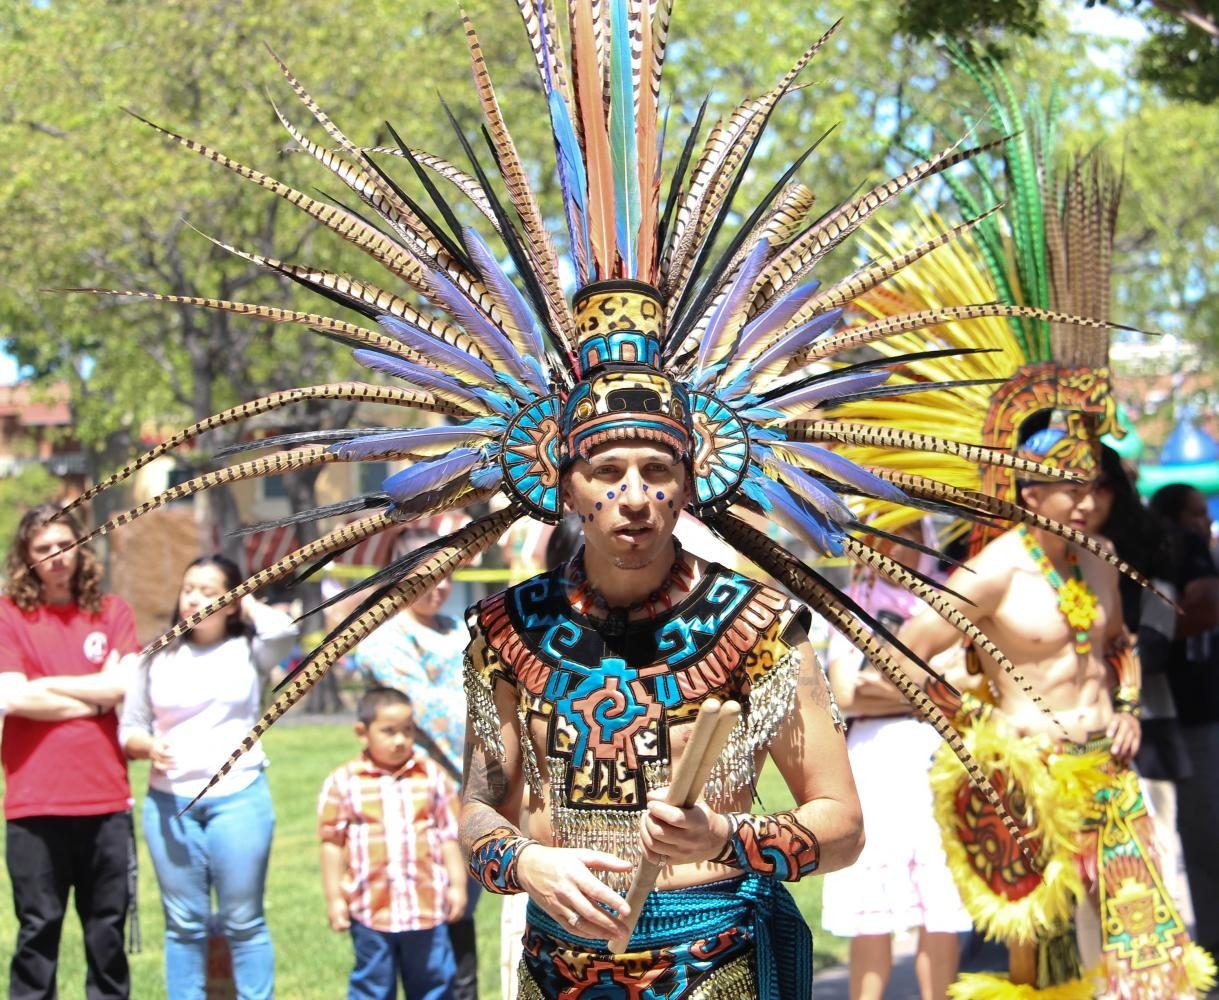 Downtown Hayward hosts Cinco De Mayo festivities